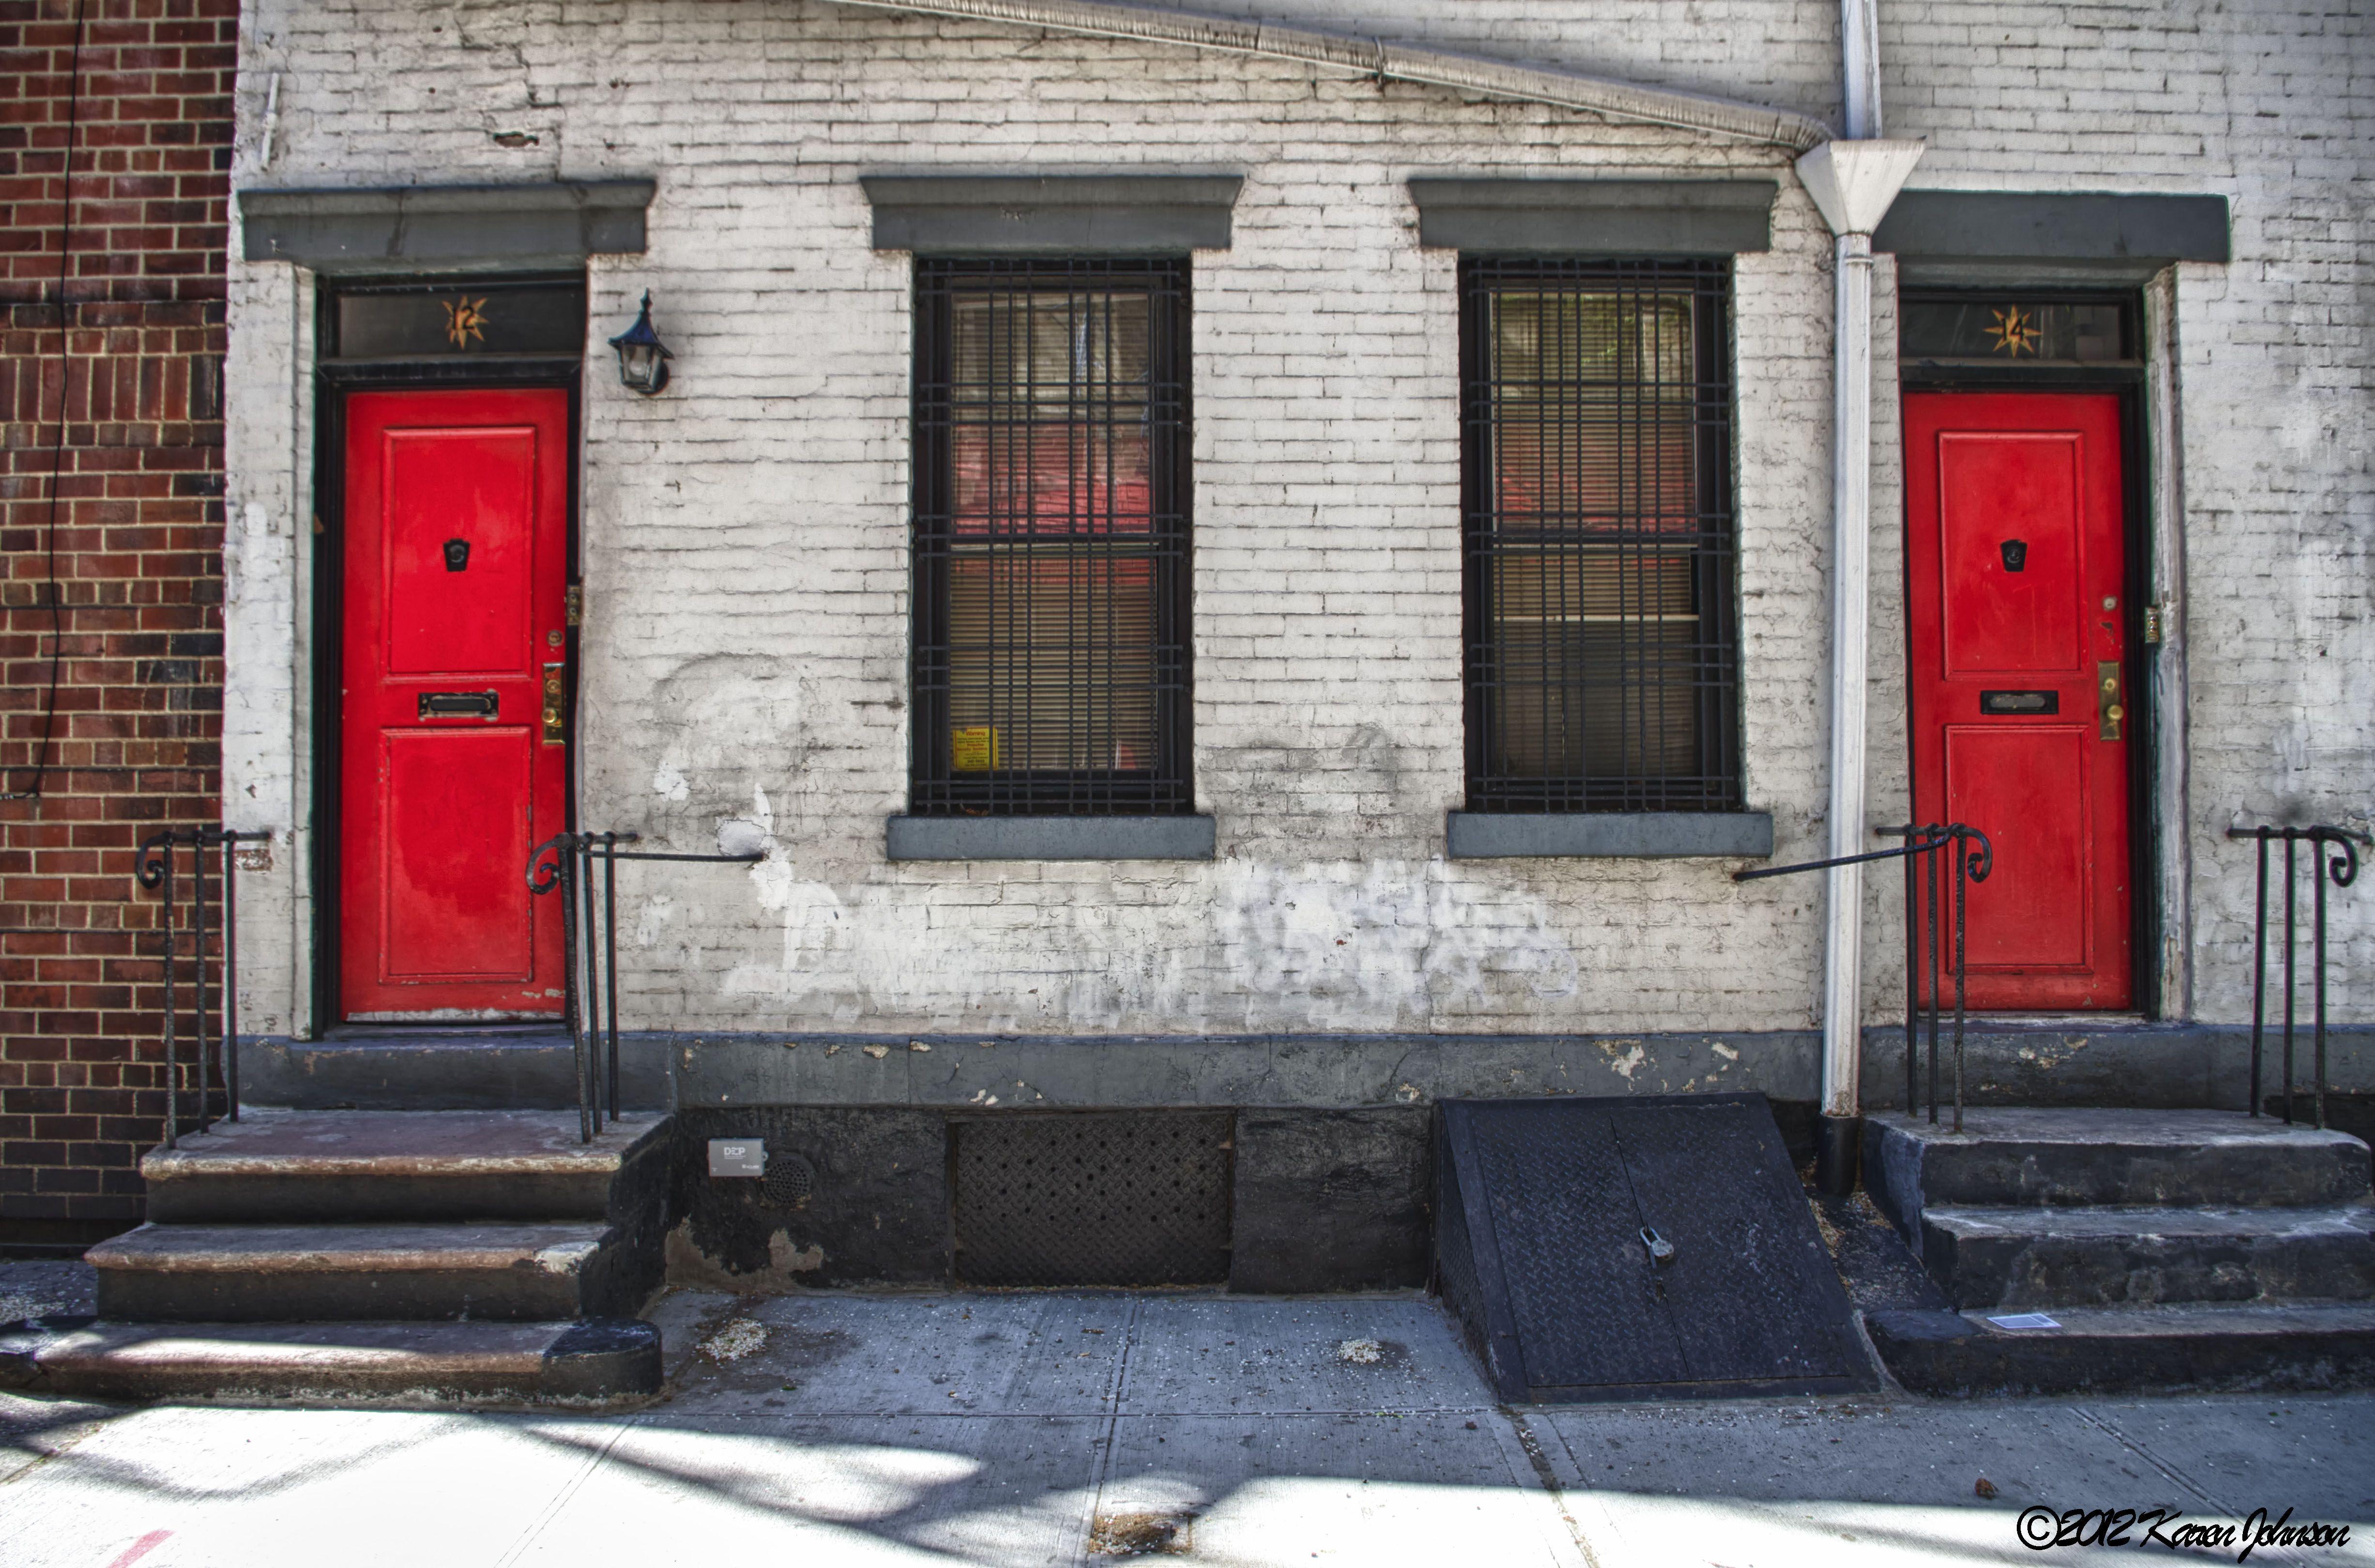 minetta st nyc - Google Search & Minetta Street \u0026 The West Village | West village and Doors